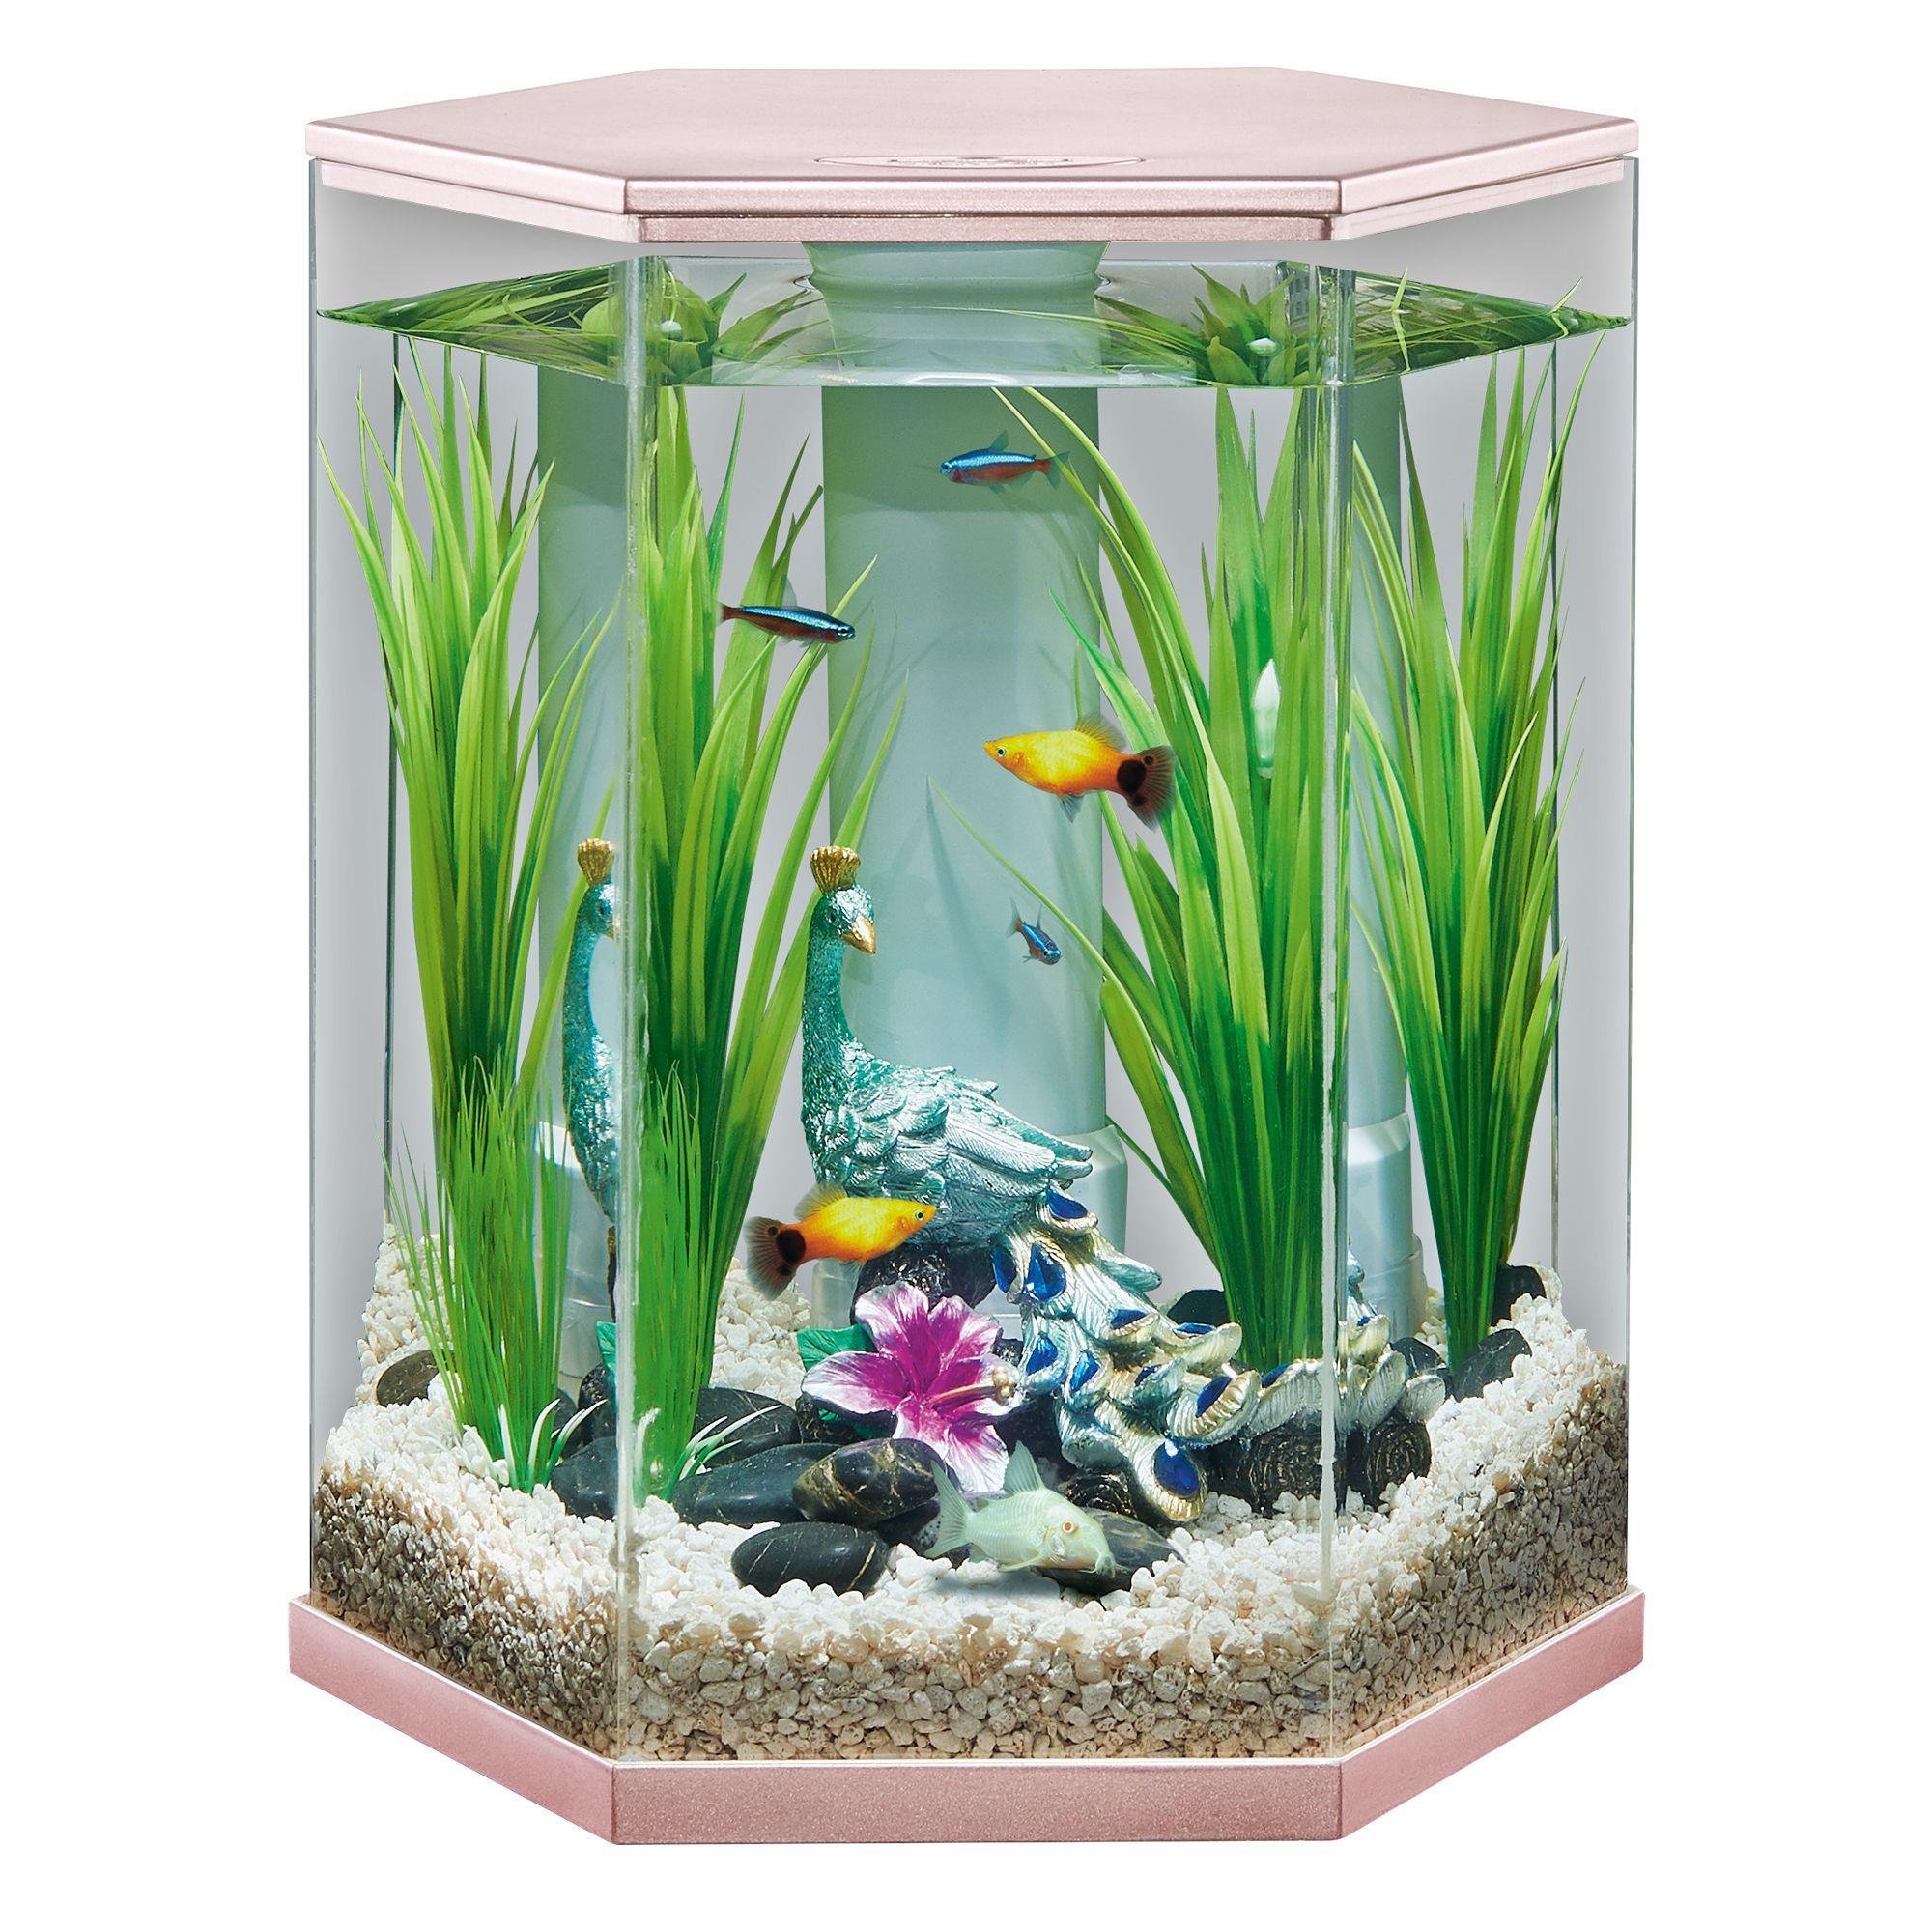 Top Fin Serenity Vivid View 360 Aquarium 3 Gallon In 2020 Diy Fishing Decor Pet Spray Pet Fish